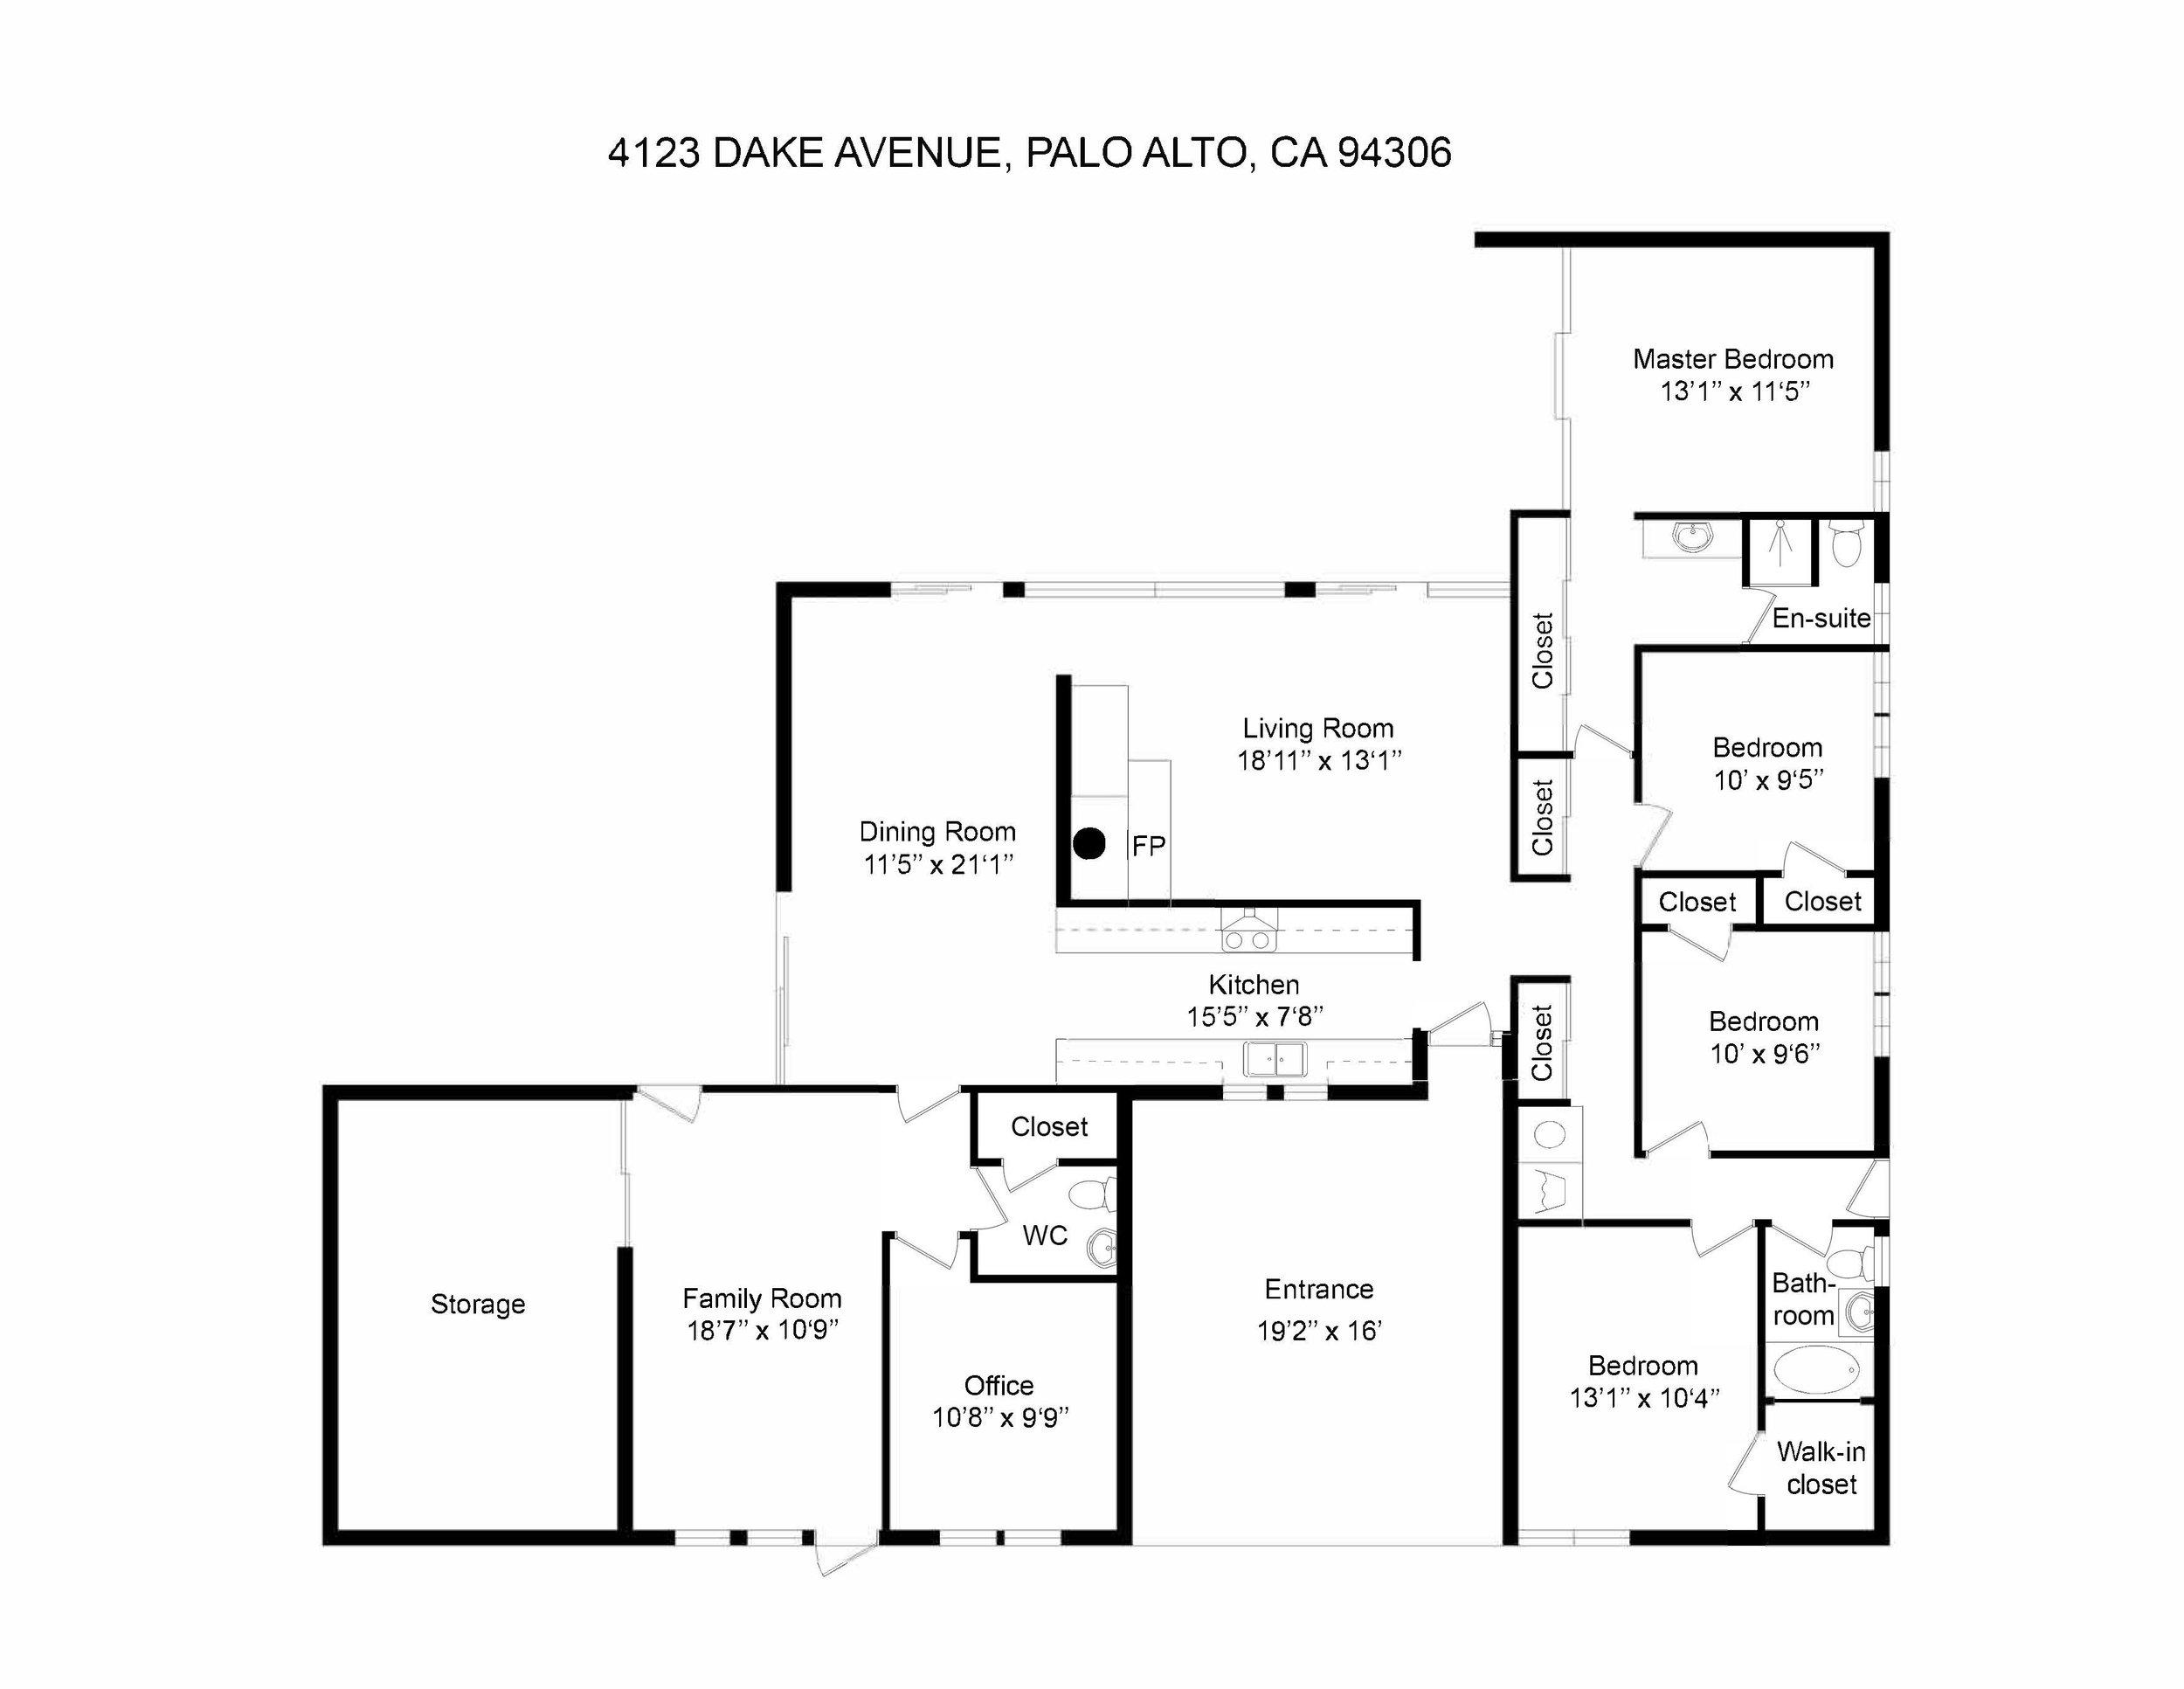 Floorplan- 4123 Dake Ave, Palo Alto, CA, 94306_2d.jpg